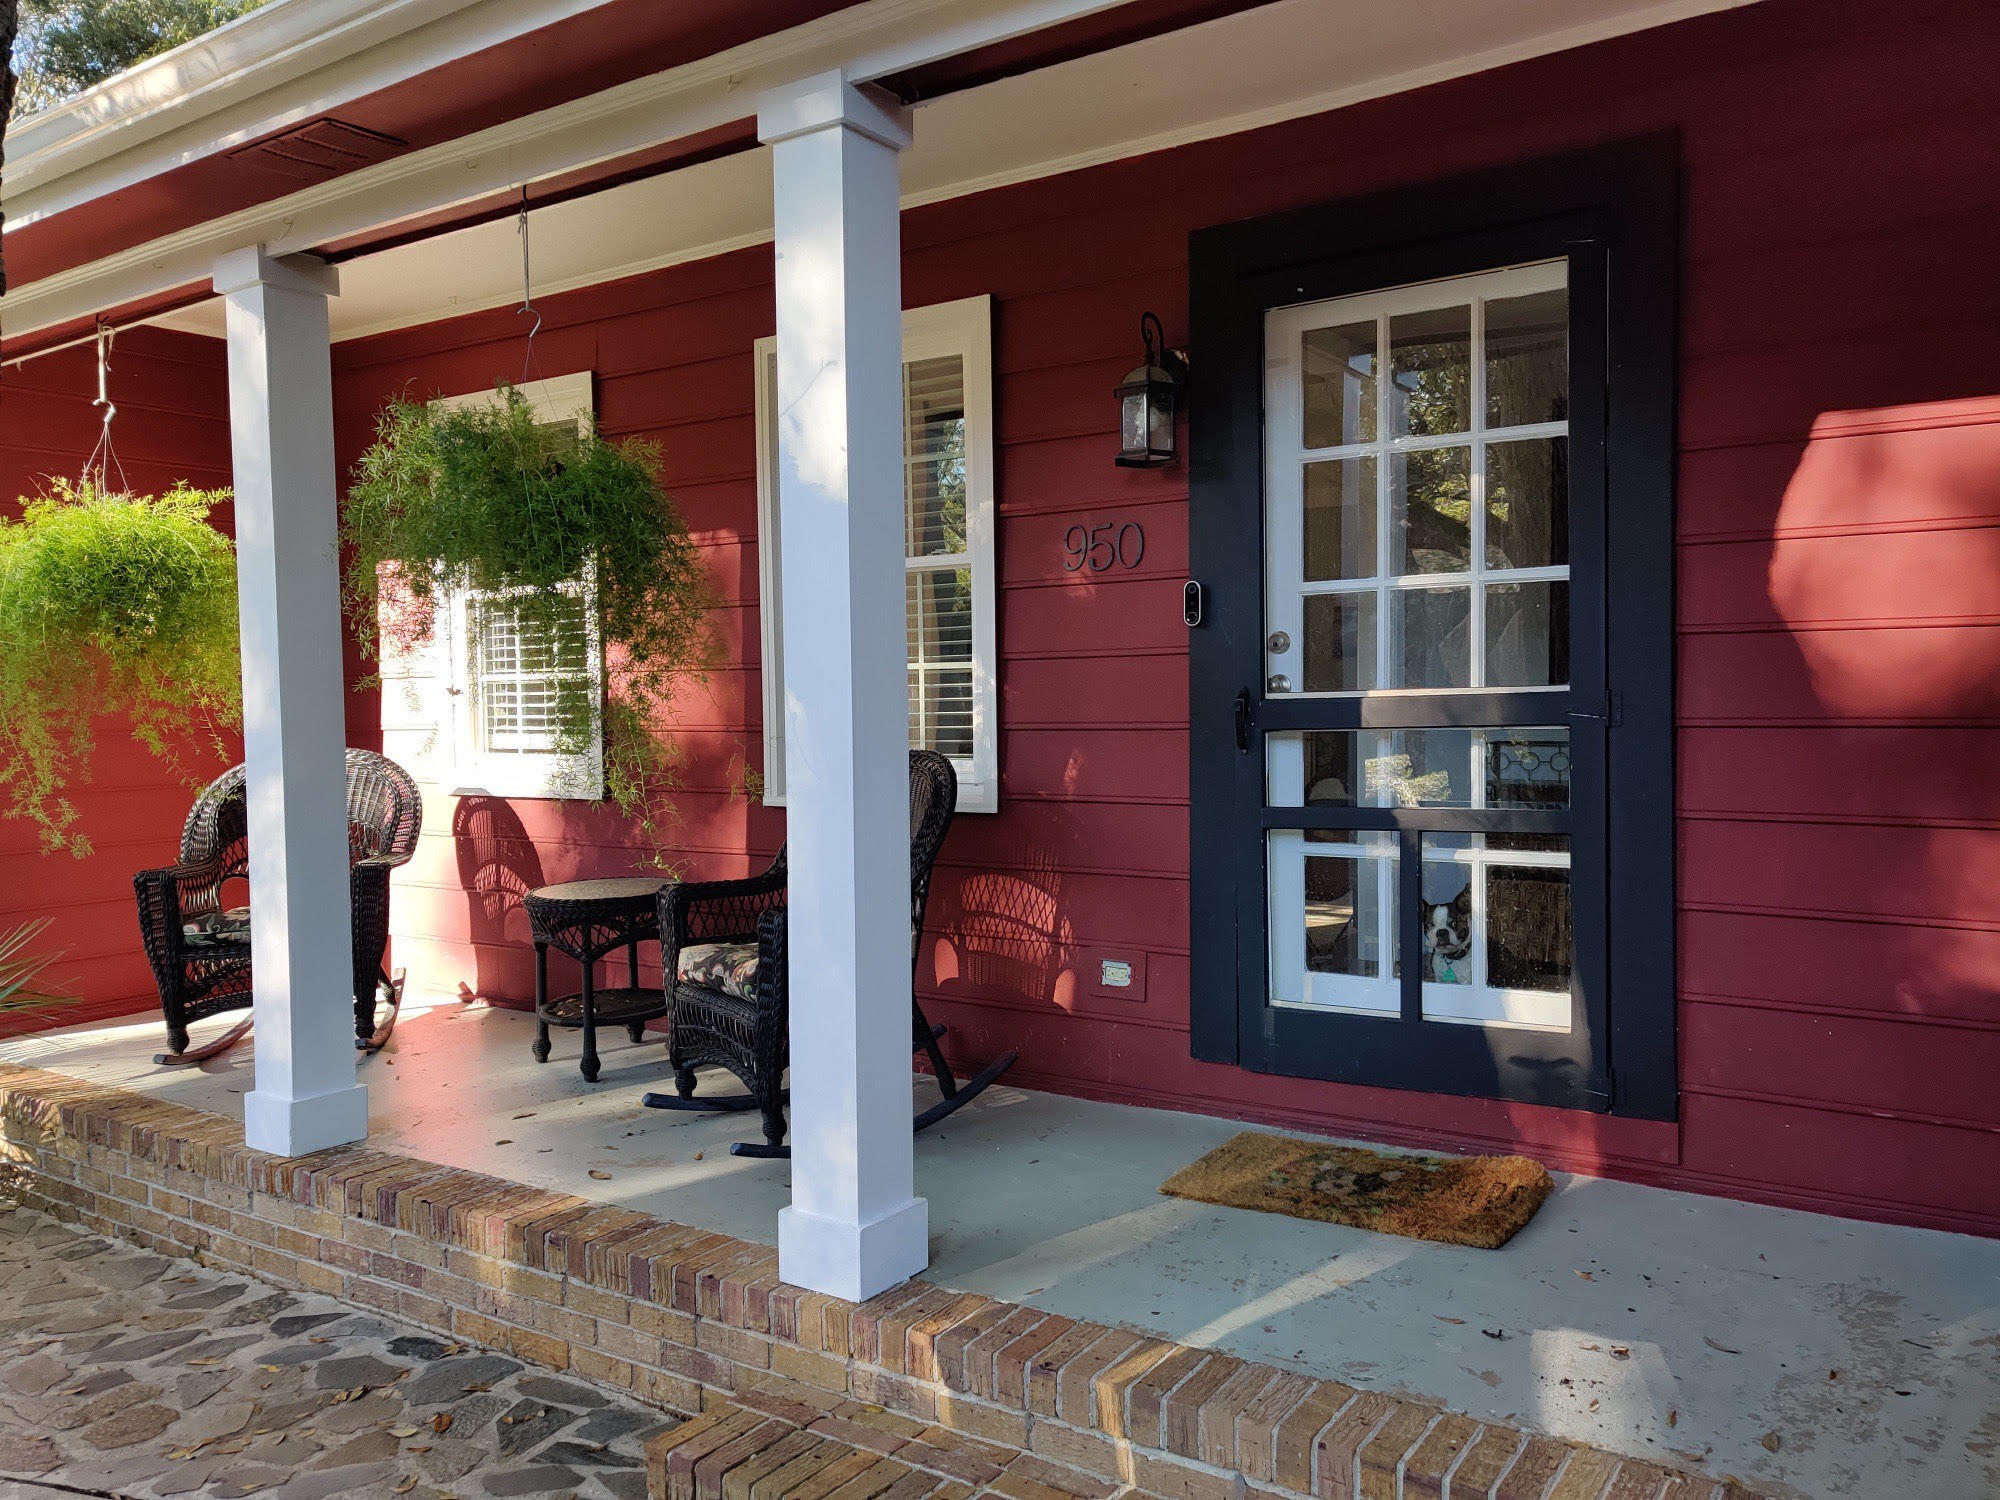 Shemwood II Homes For Sale - 950 Sea Gull, Mount Pleasant, SC - 21